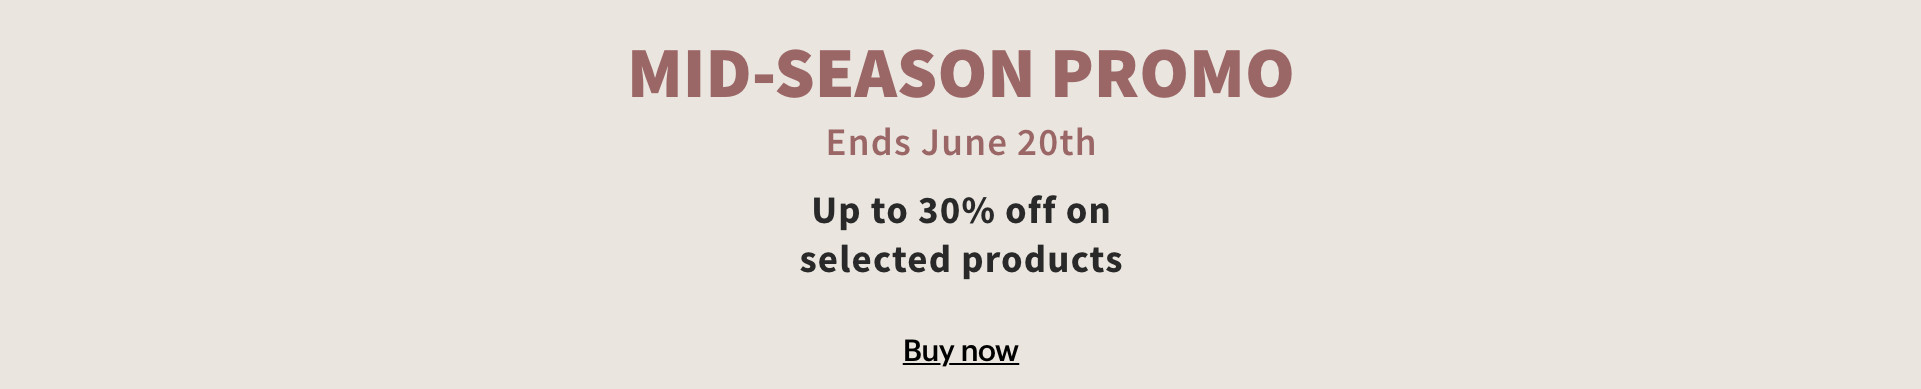 Mid Season Promo up to -30% off